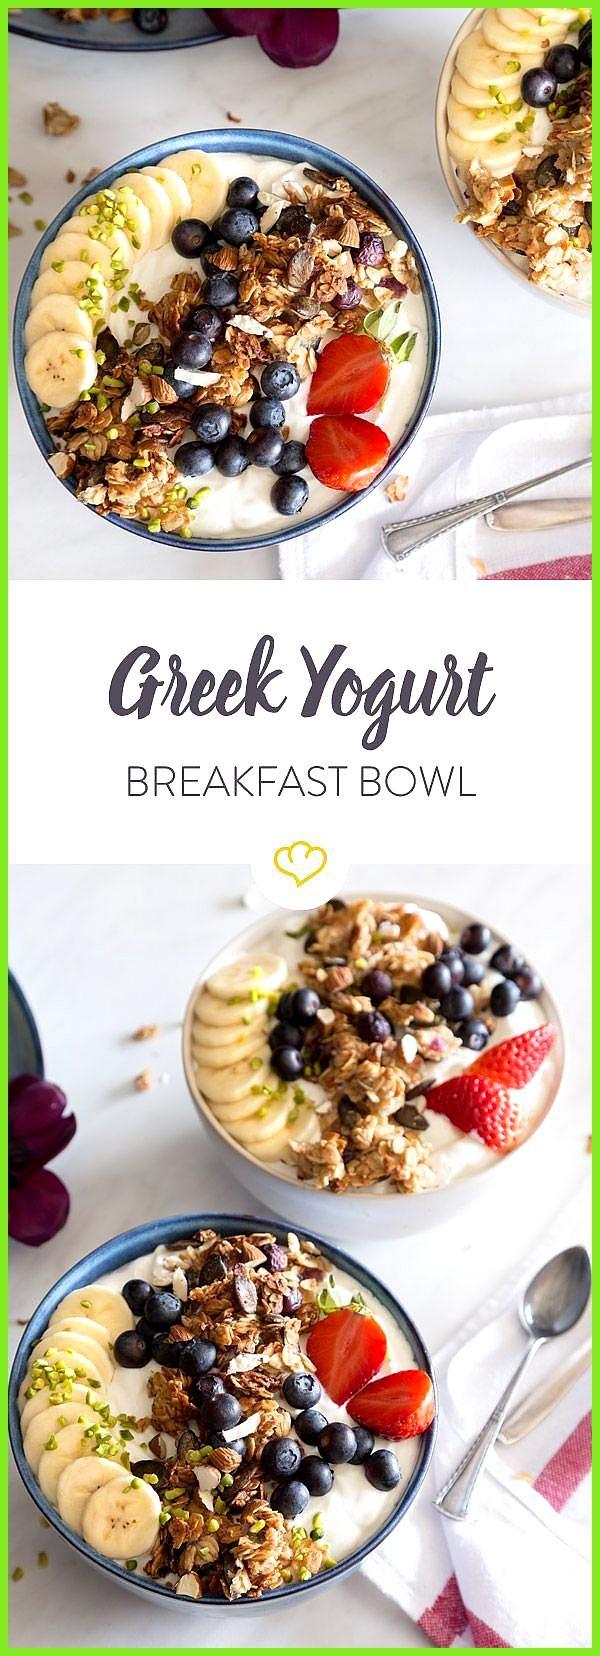 Greek Yogurt Breakfast Bowl mit Blaubeer-Granola und Nüssen #BlaubeerGranola #Bowl #Breakfast #Fitne...